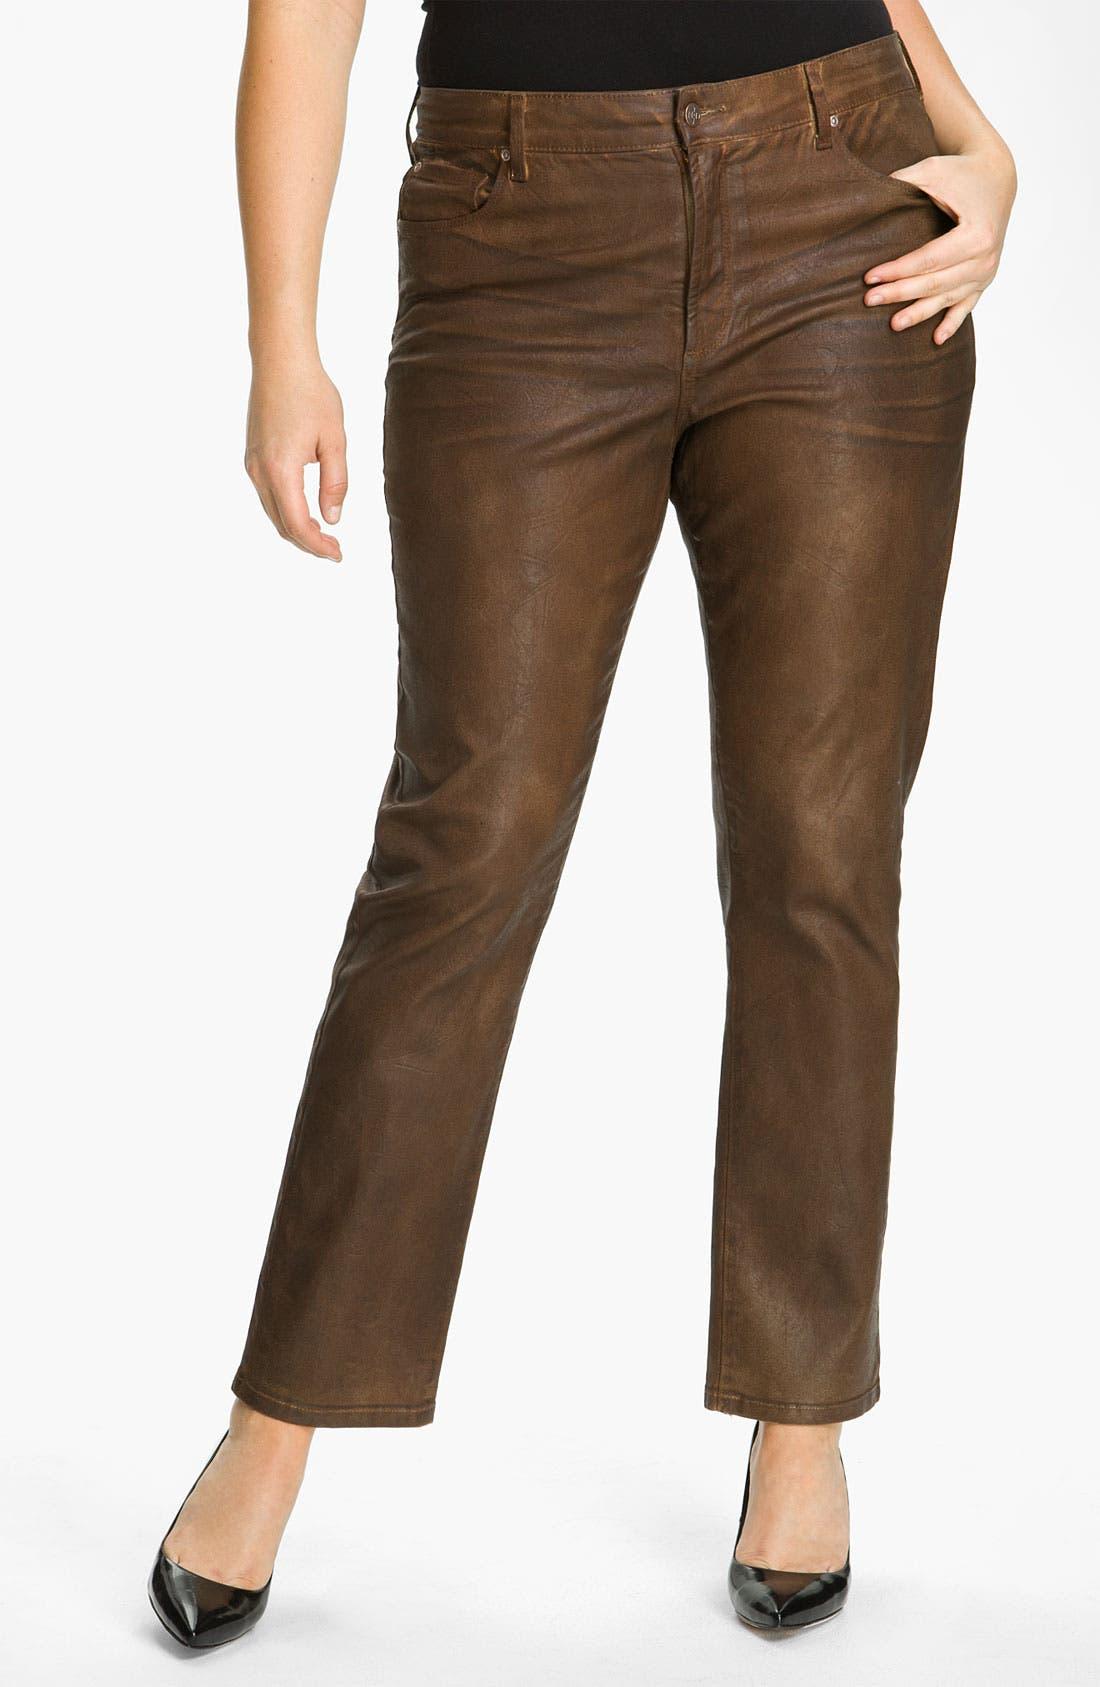 Alternate Image 1 Selected - NYDJ 'Sheri' Skinny Terra Hide Jeans (Plus)